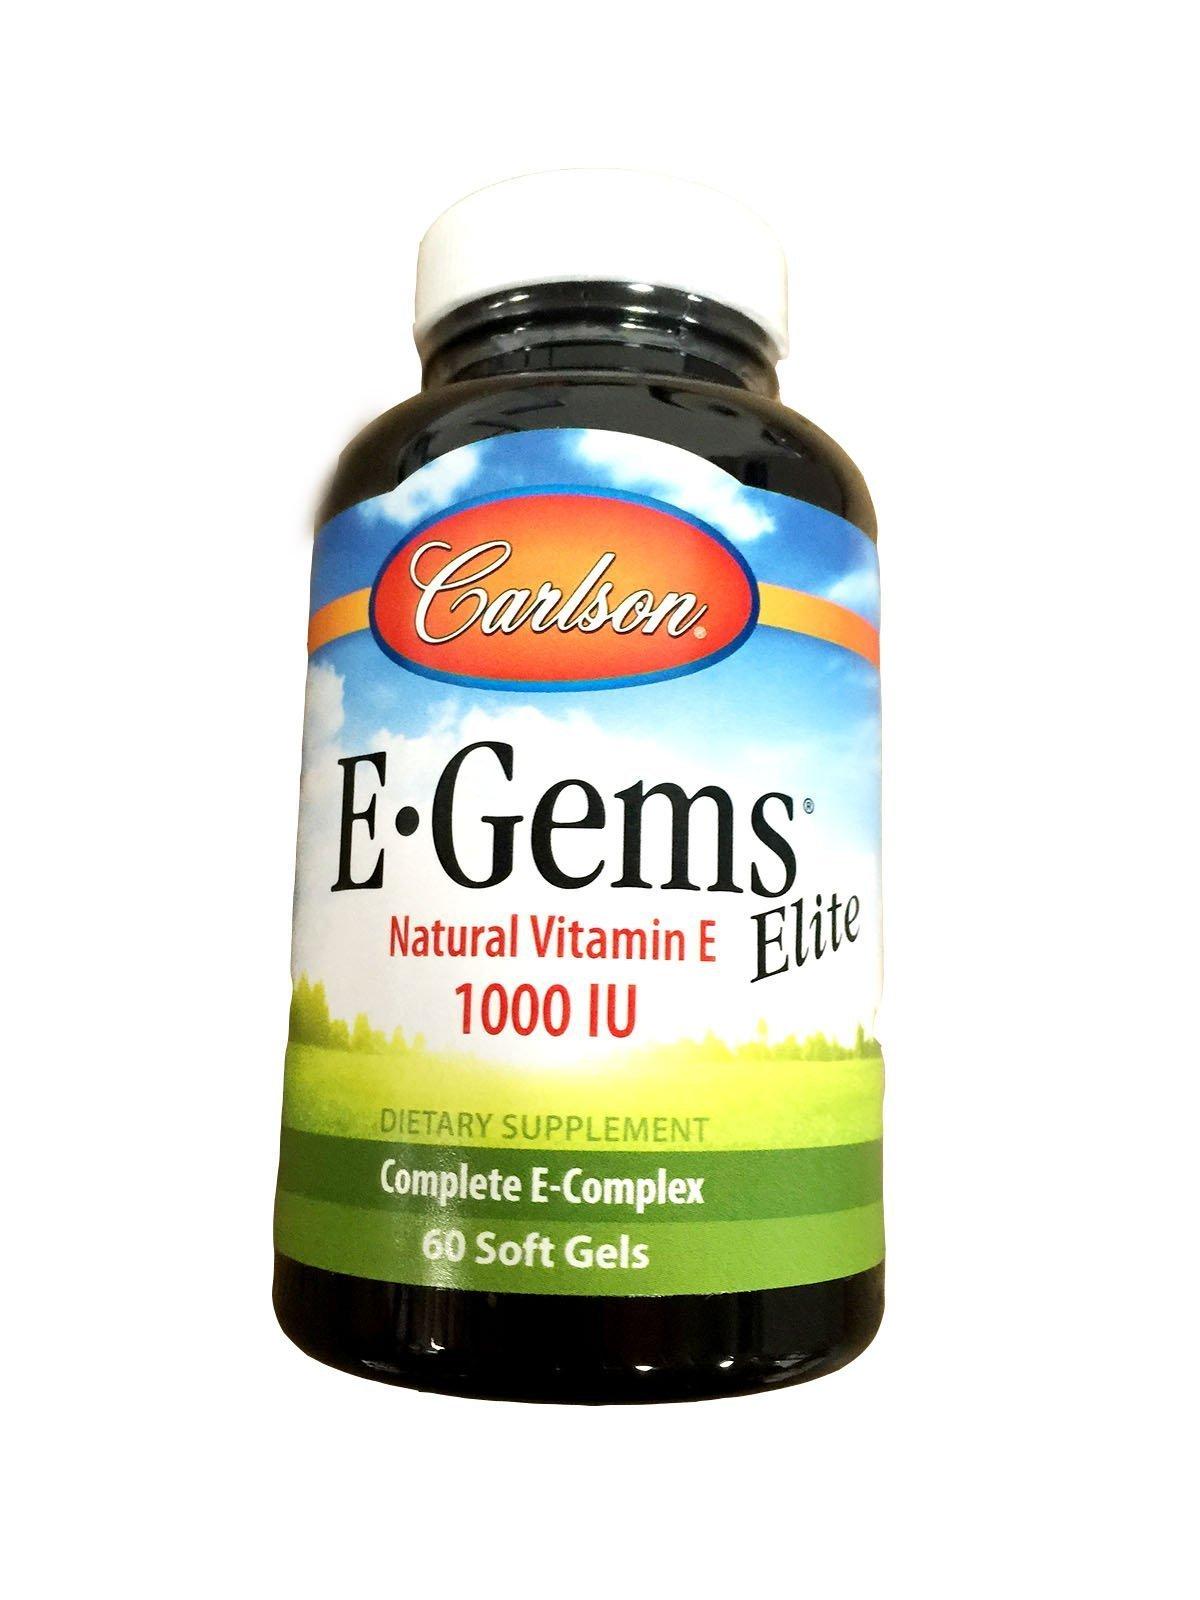 Carlson Labs E-Gems Natural Vitamin E Elite, 1000 IU, 60 Softgels